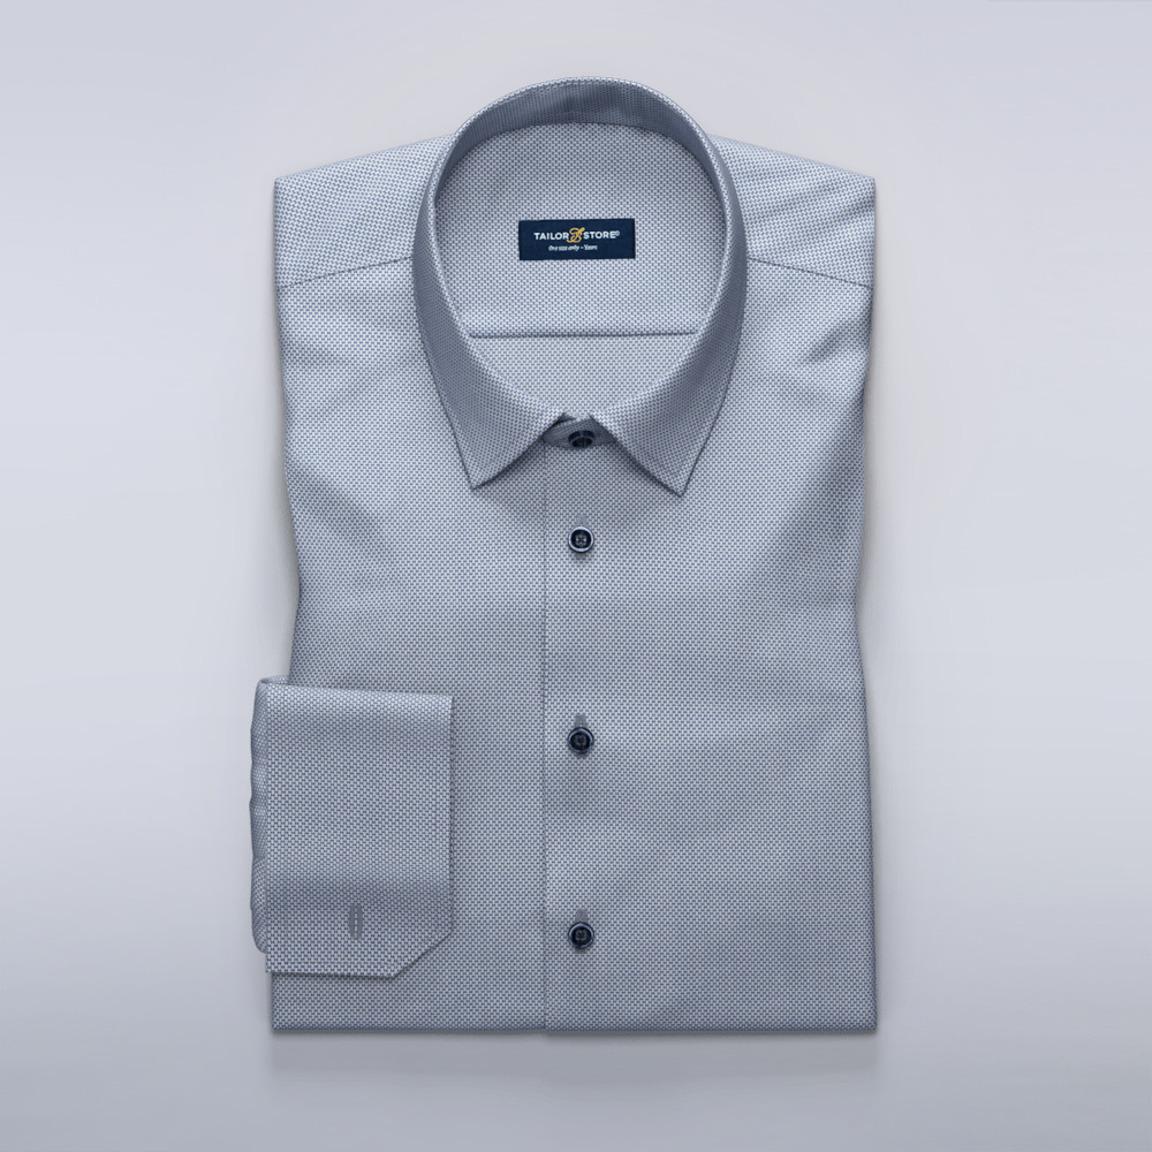 Dark blue business shirt in dobby weave